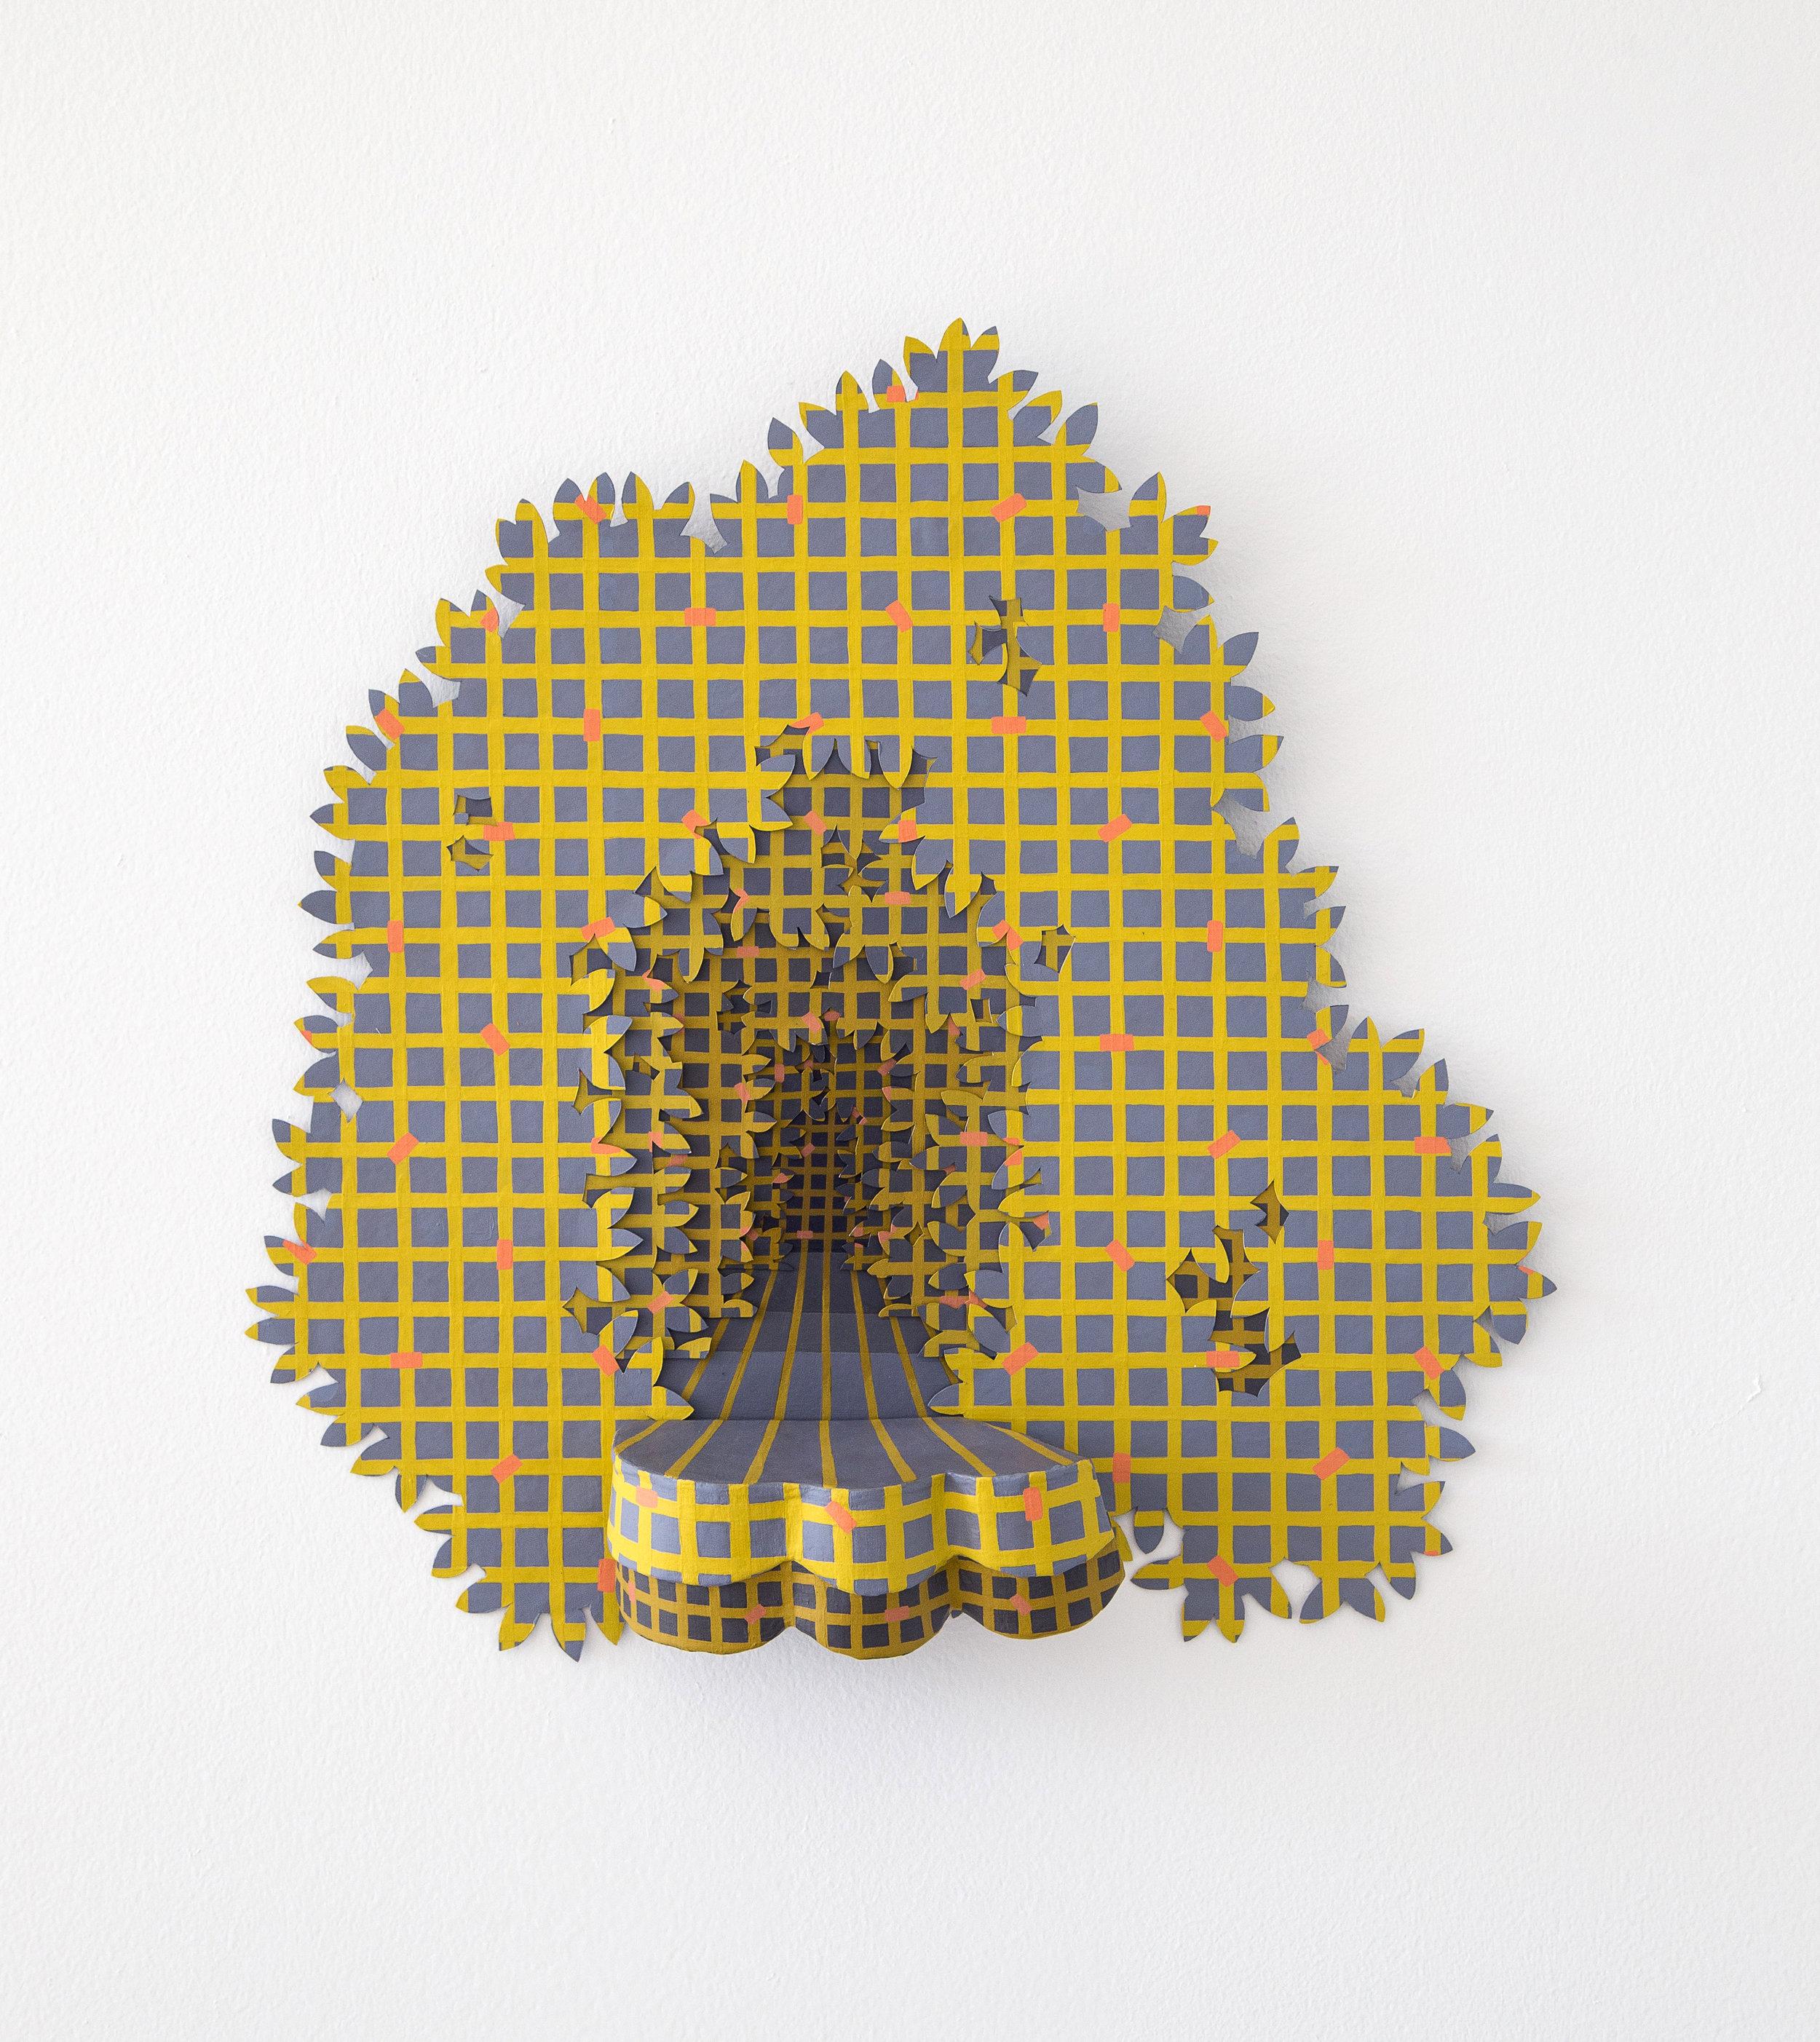 Lattice Supertemporal    Gouache, tyvek, and paper mache; 19 x 19.5 x 4 inches; 2017